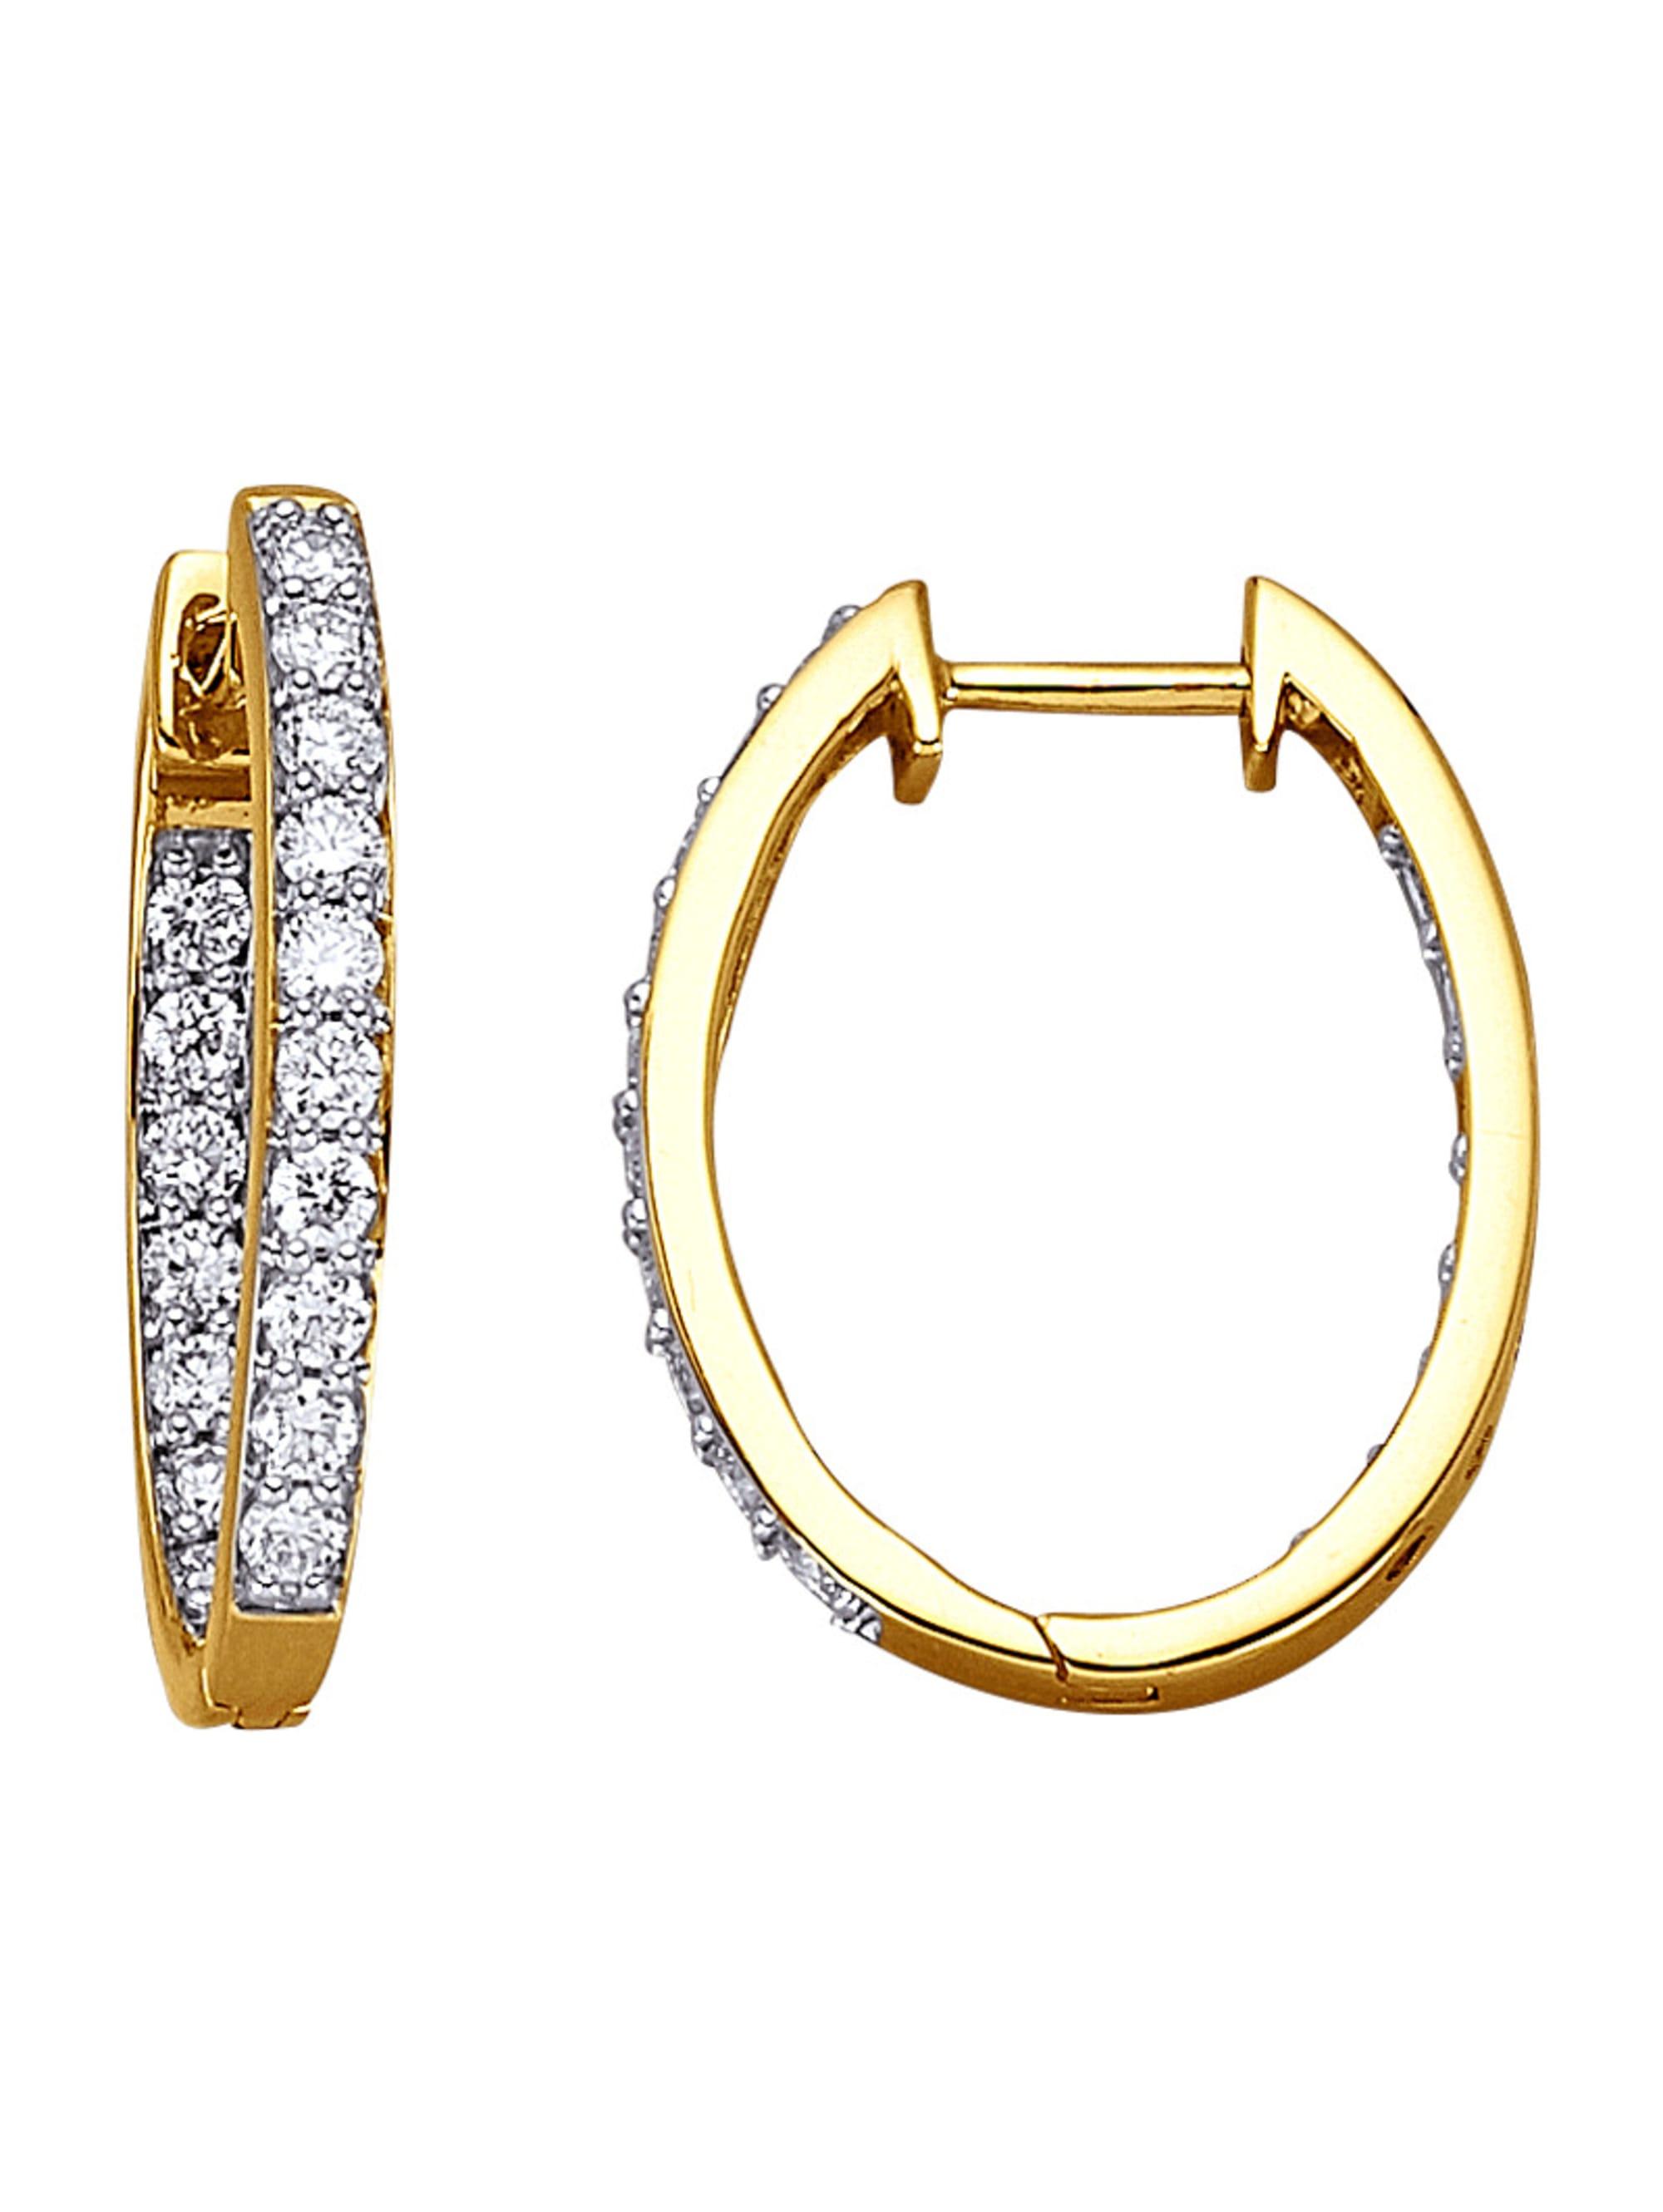 Diemer Diamant Klappcreolen mit Brillanten E0mgz